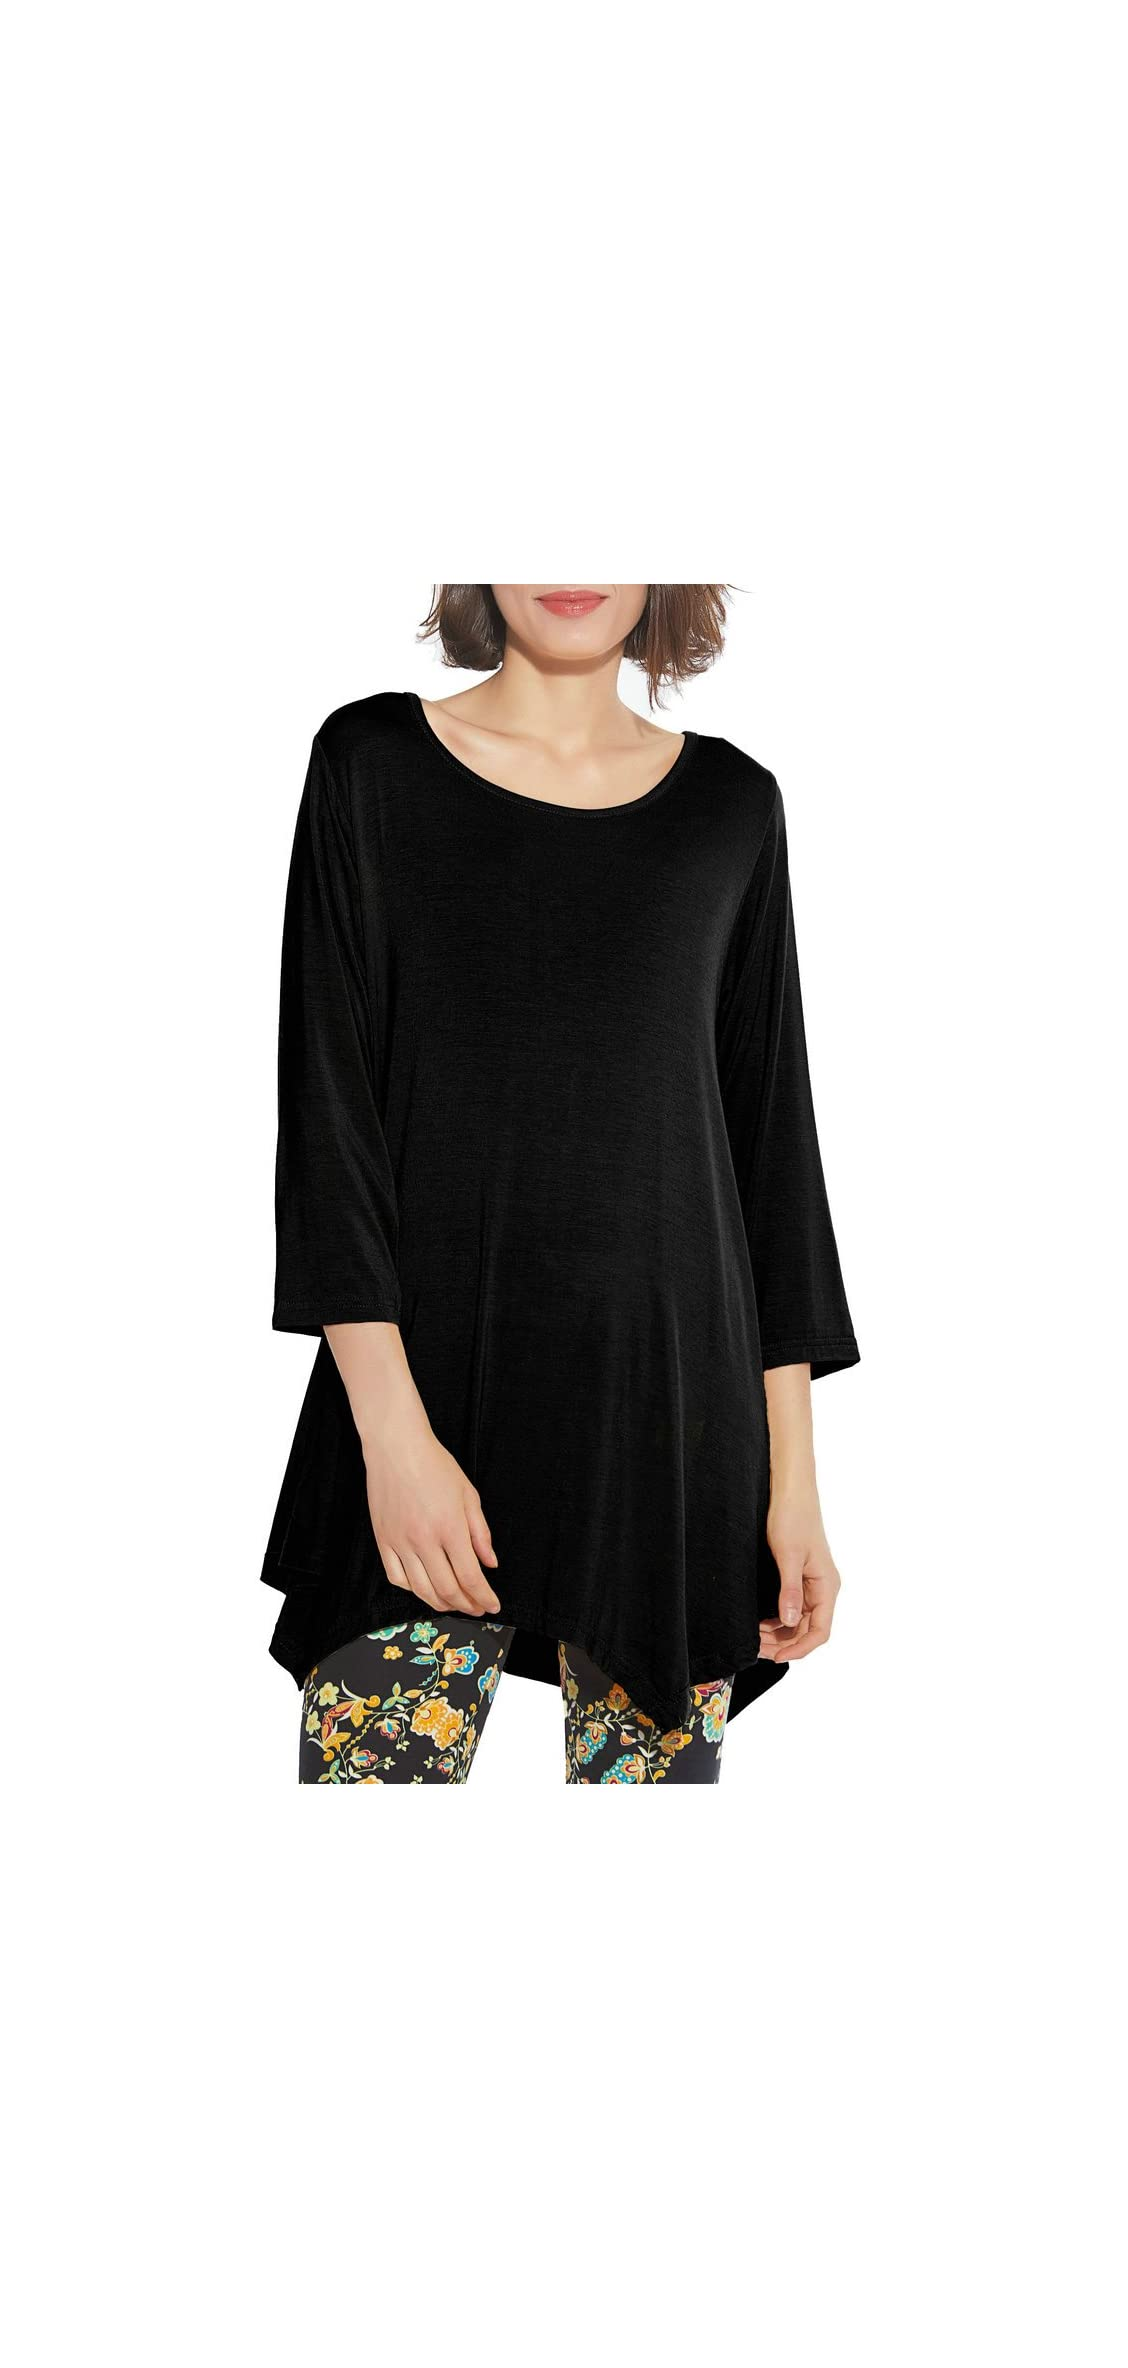 Women / Sleeve Swing Tunic Tops Plus Size T Shirt